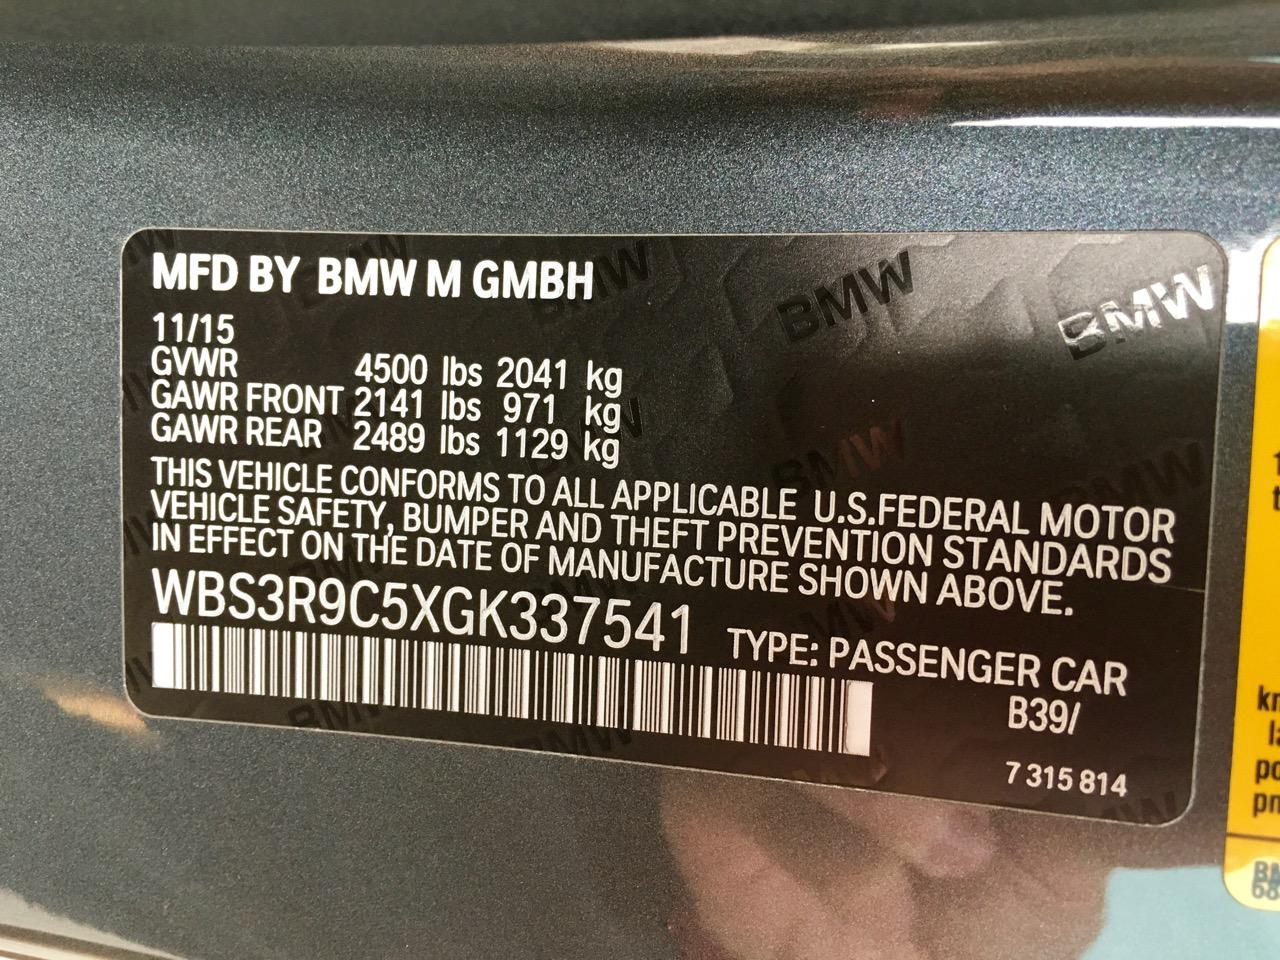 2016 BMW M4 (GK337541) - 30.jpg